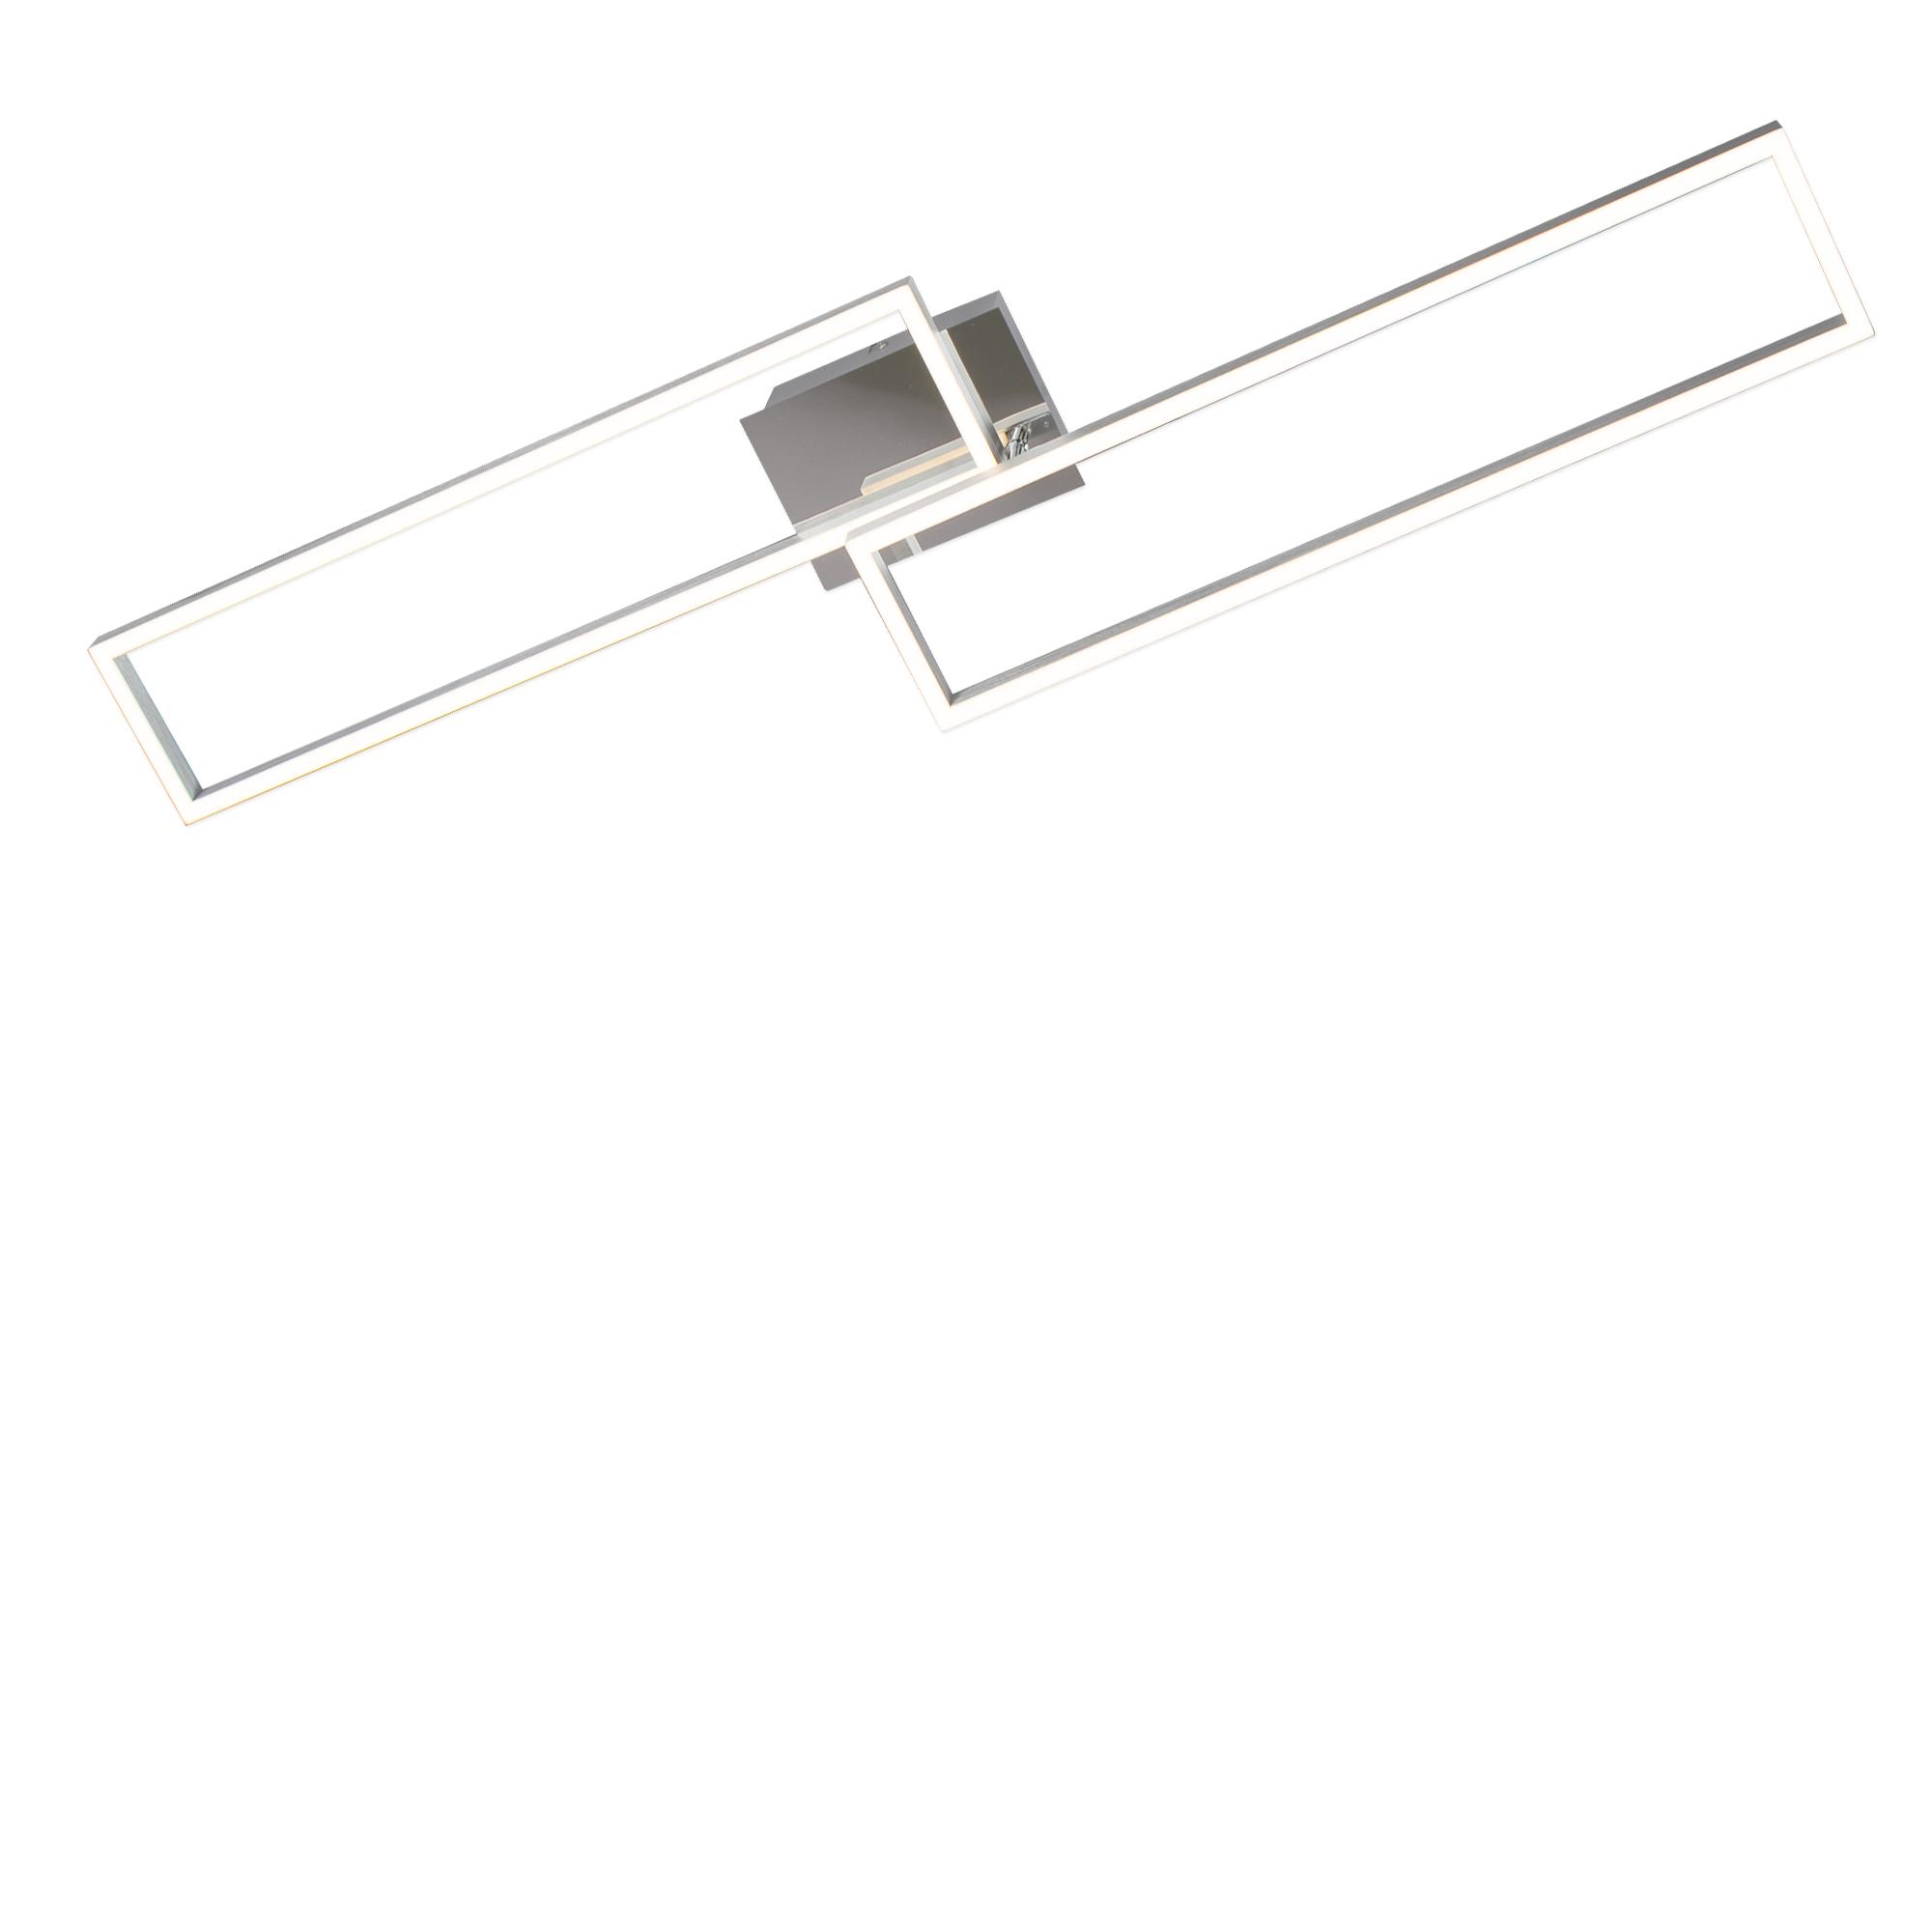 Smart LED Deckenleuchte, 110 cm, 4400 LM, 40 W, Alu